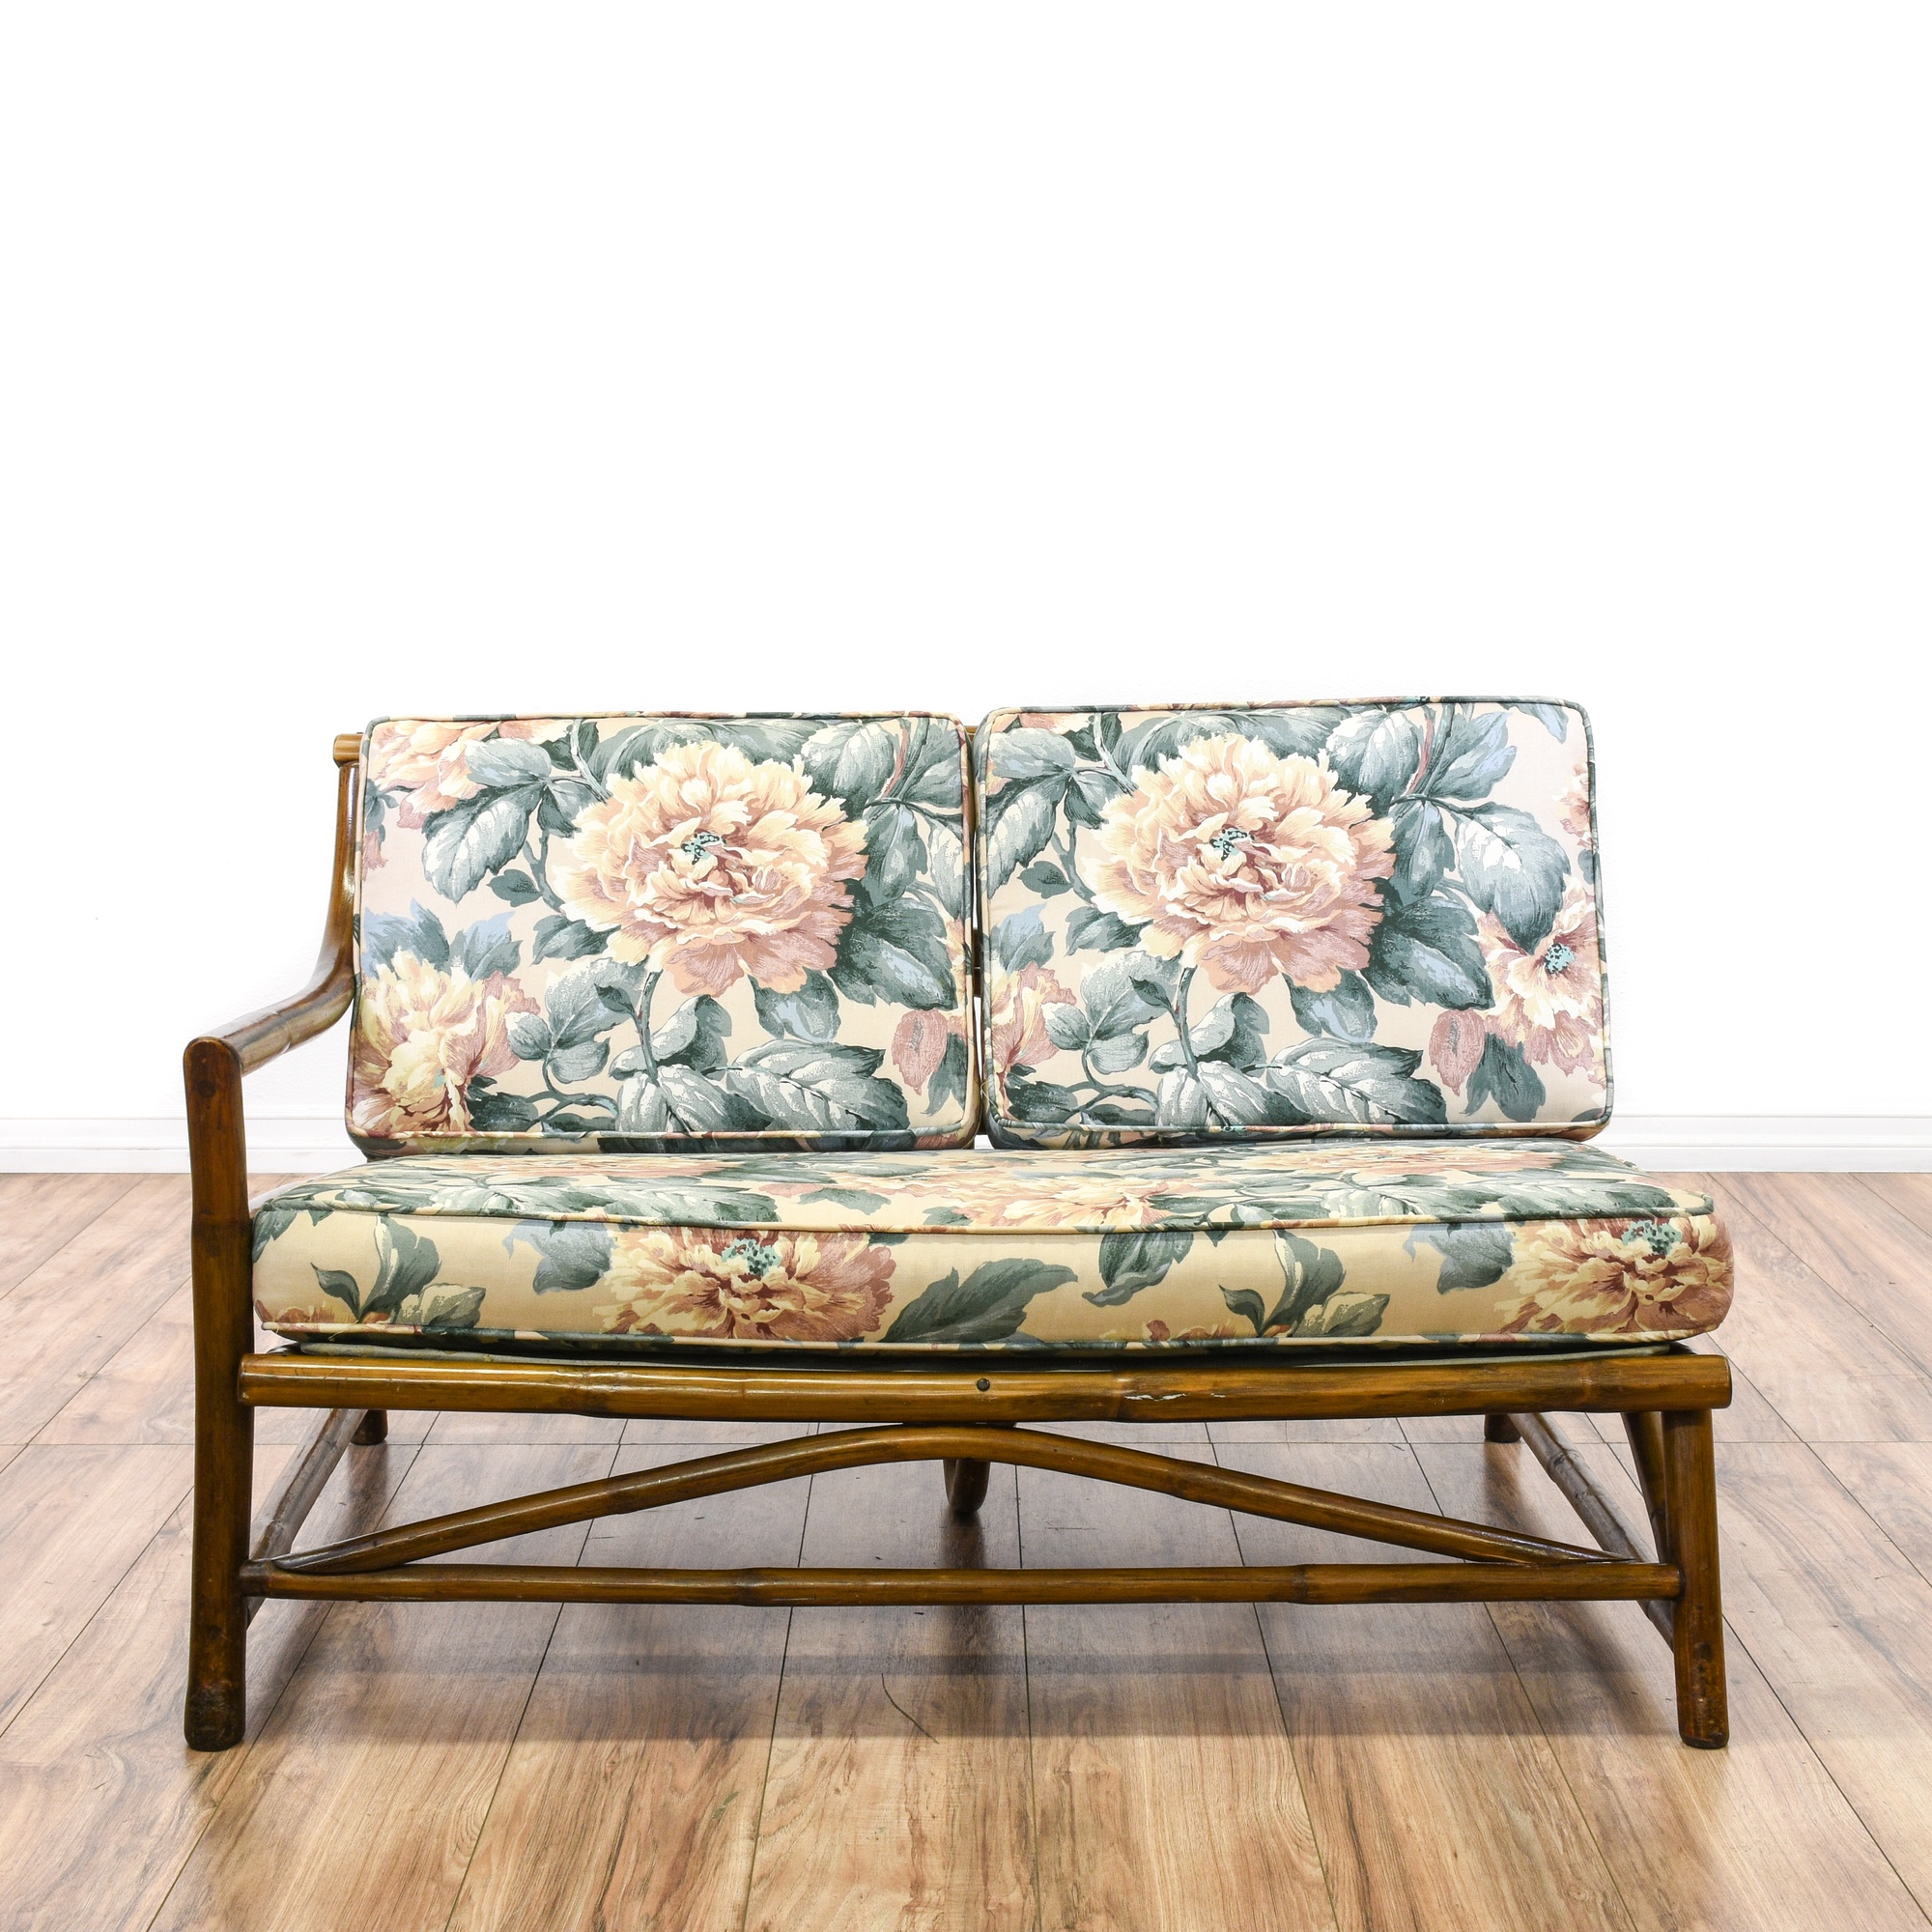 Pair Of Bamboo Floral Loveseats Loveseat Vintage Furniture San Diego Los Angeles